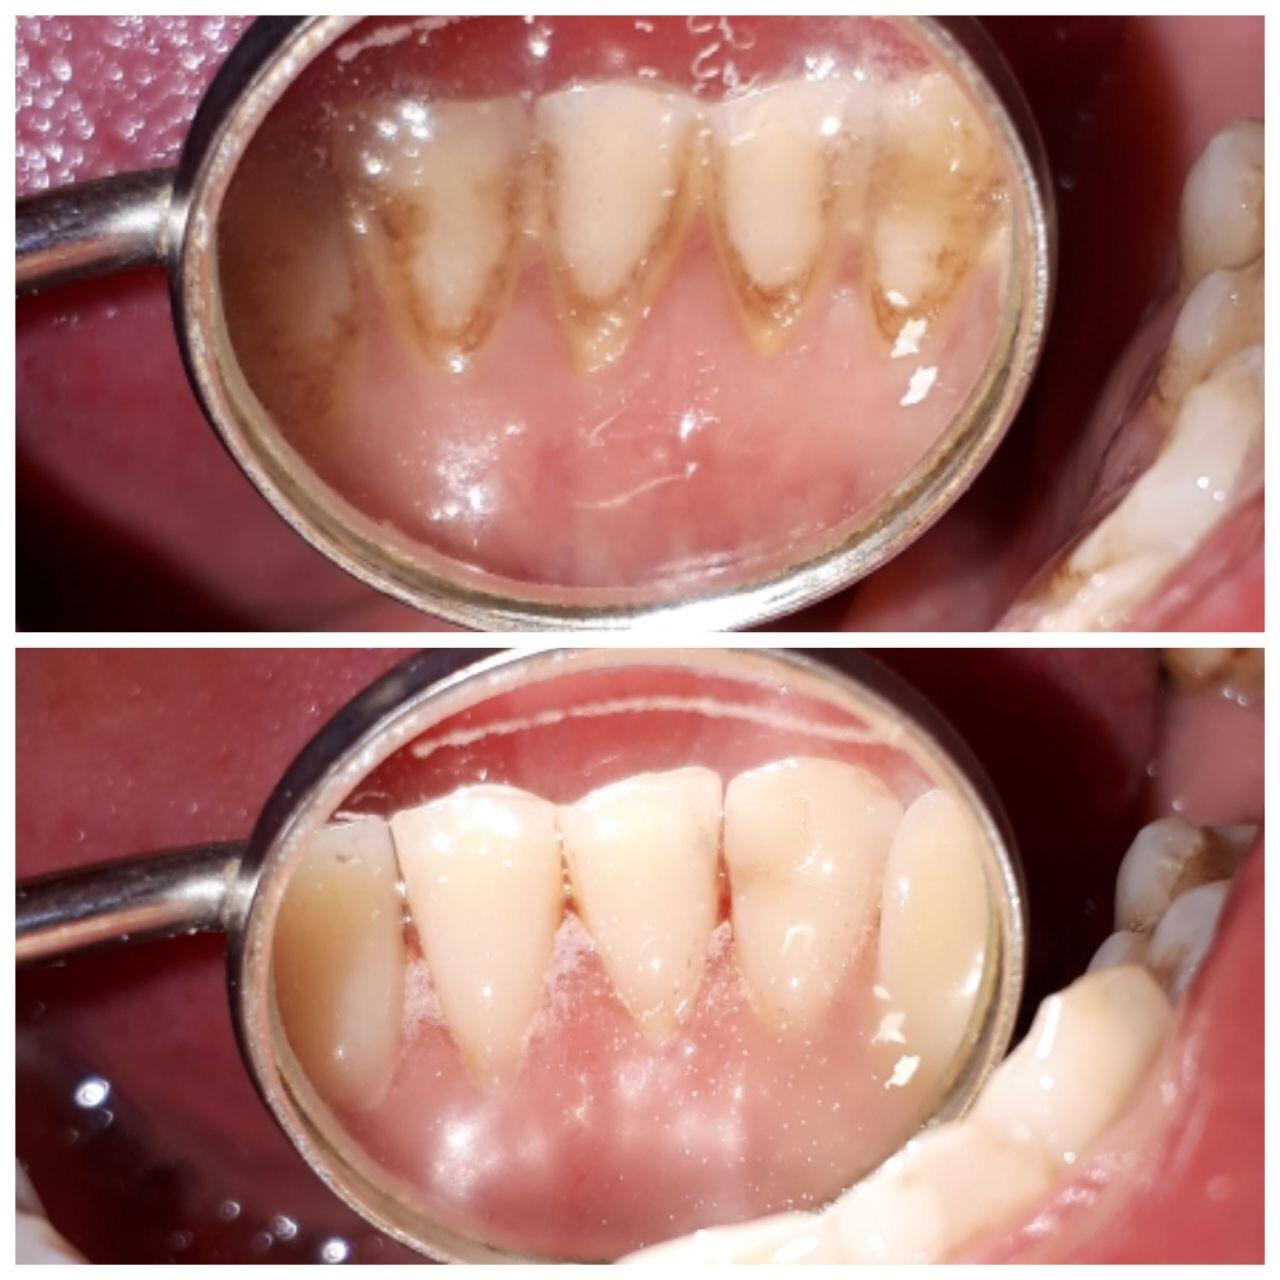 Удалять зубной камень в домашних условиях 385